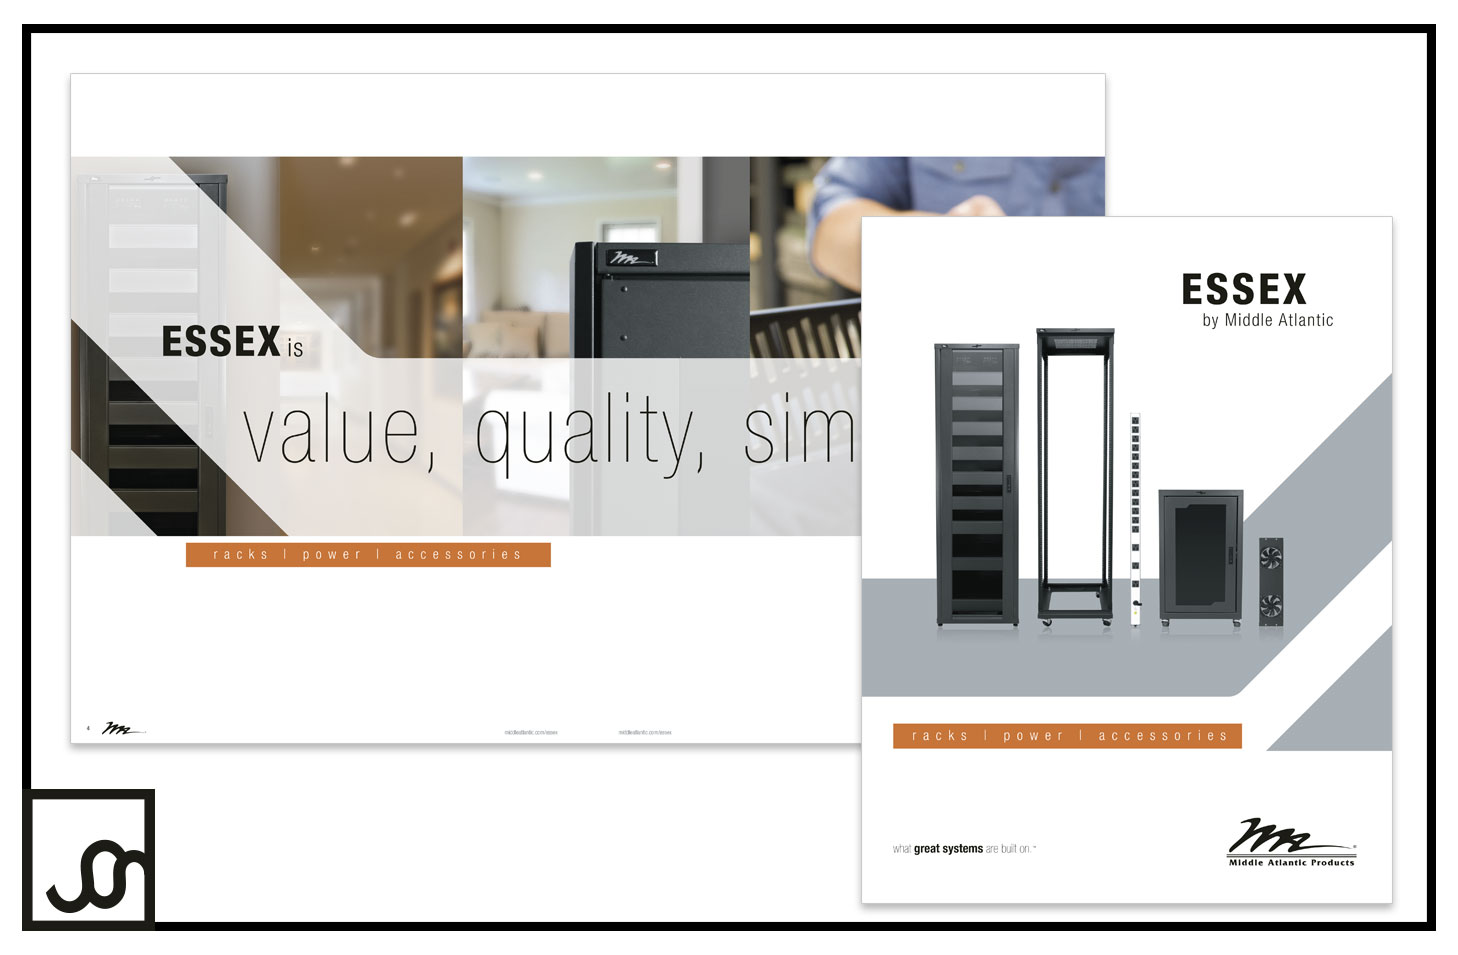 Essex Product Line Brochure